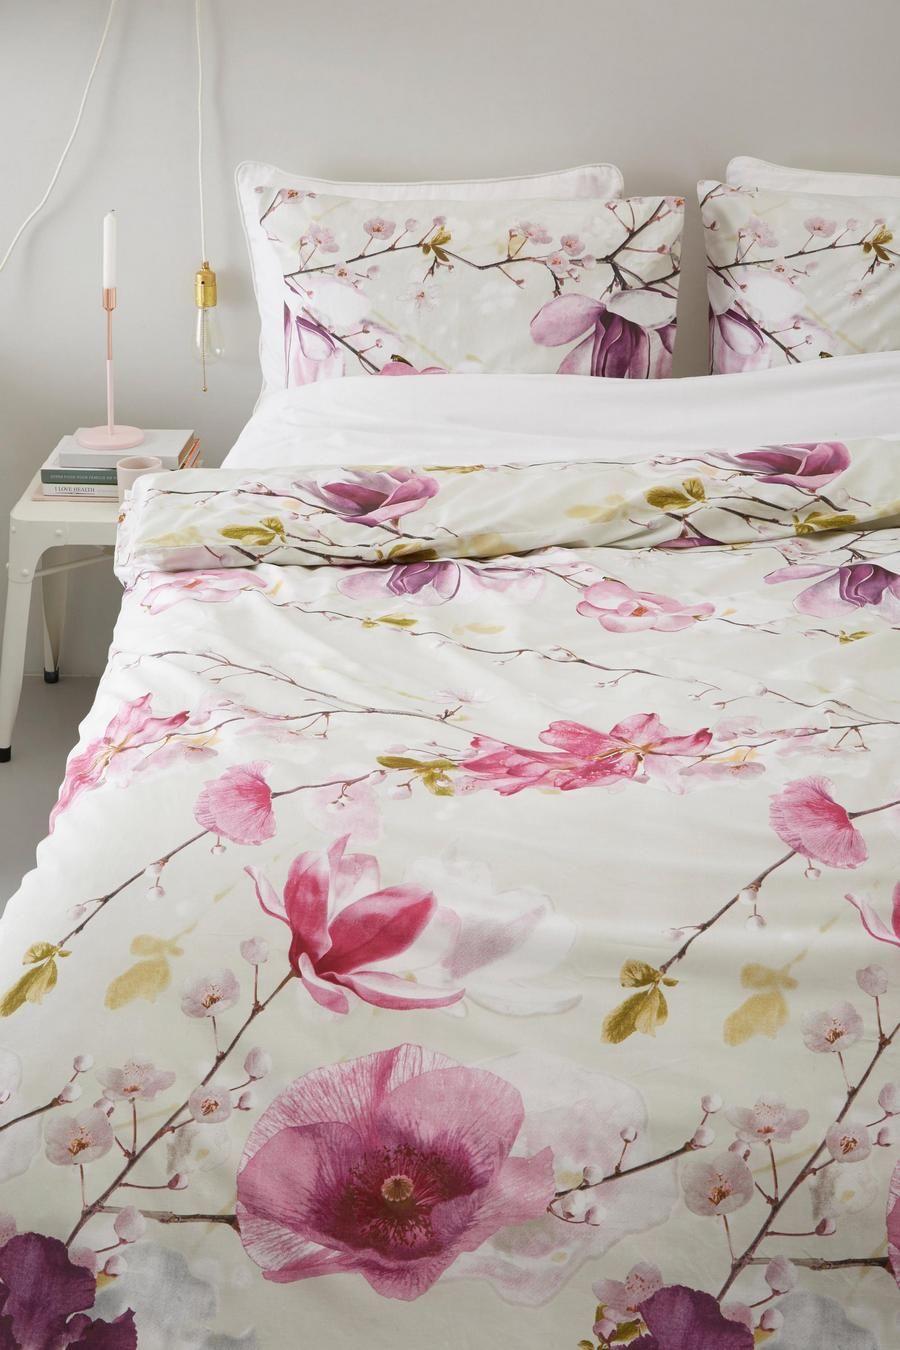 Heckettlane - Helena roze dekbedovertrek